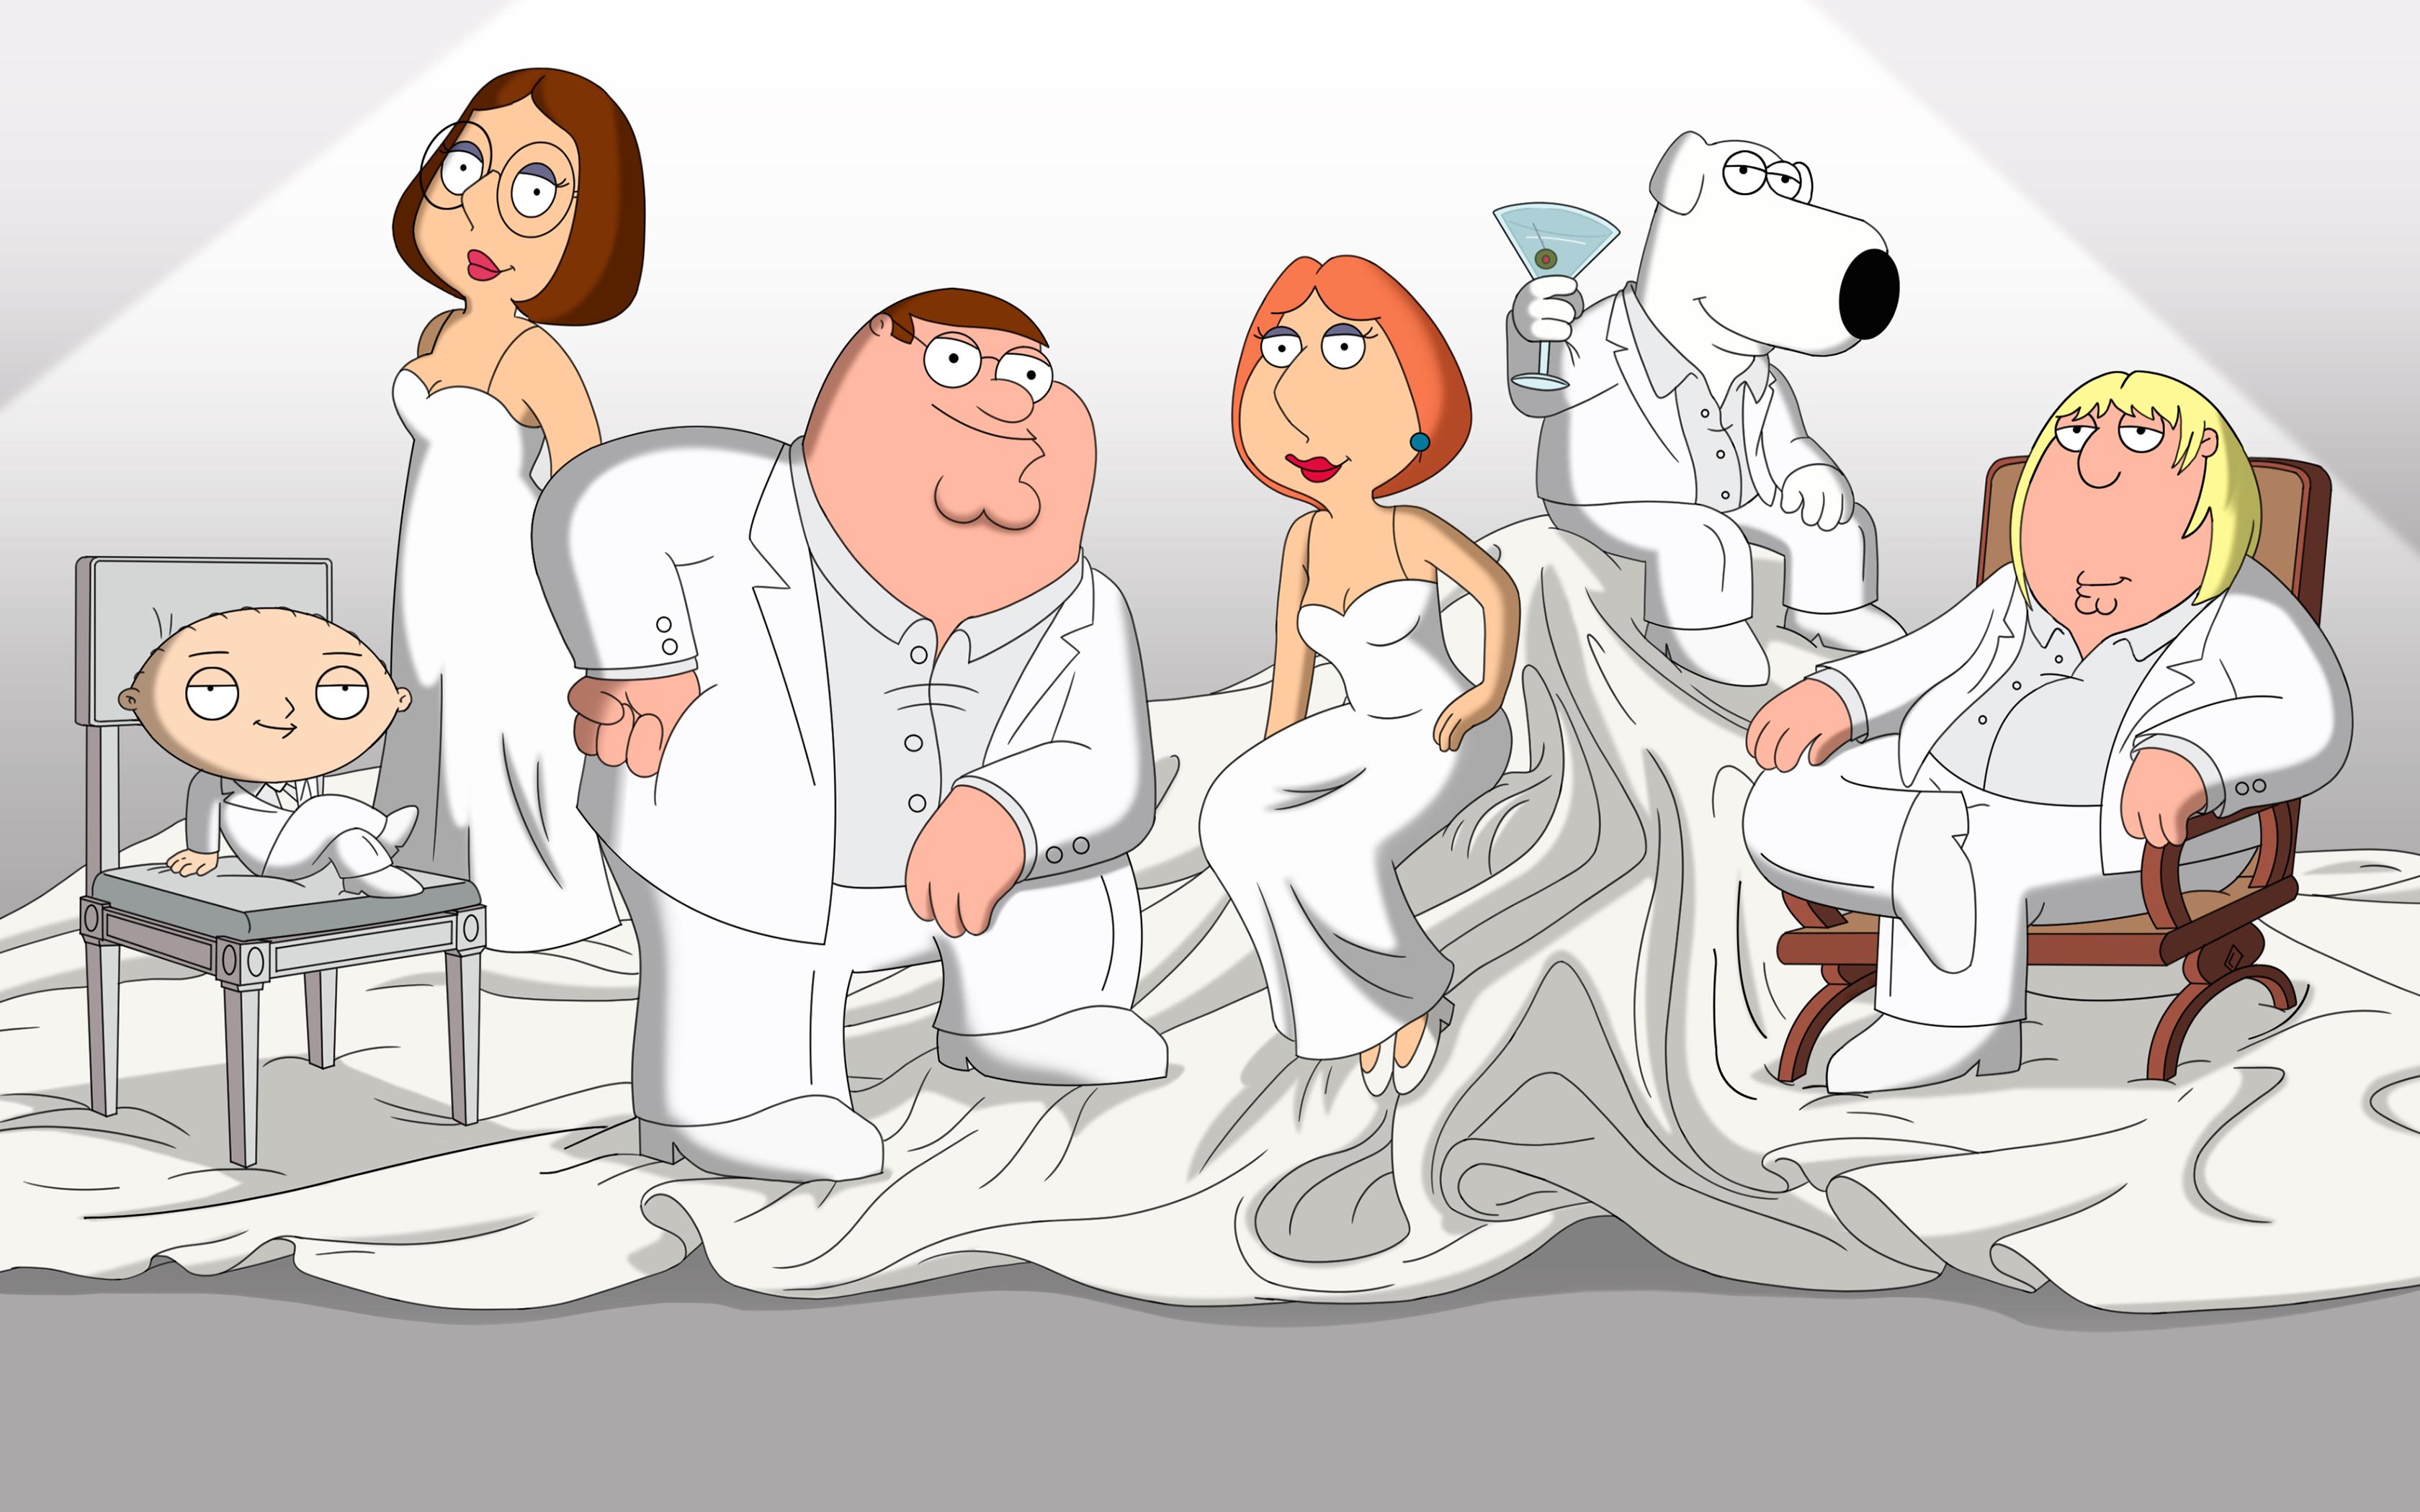 Wallpaper Family Guy Tv Series Peter Griffin 3360x2100 Depsz 1392153 Hd Wallpapers Wallhere